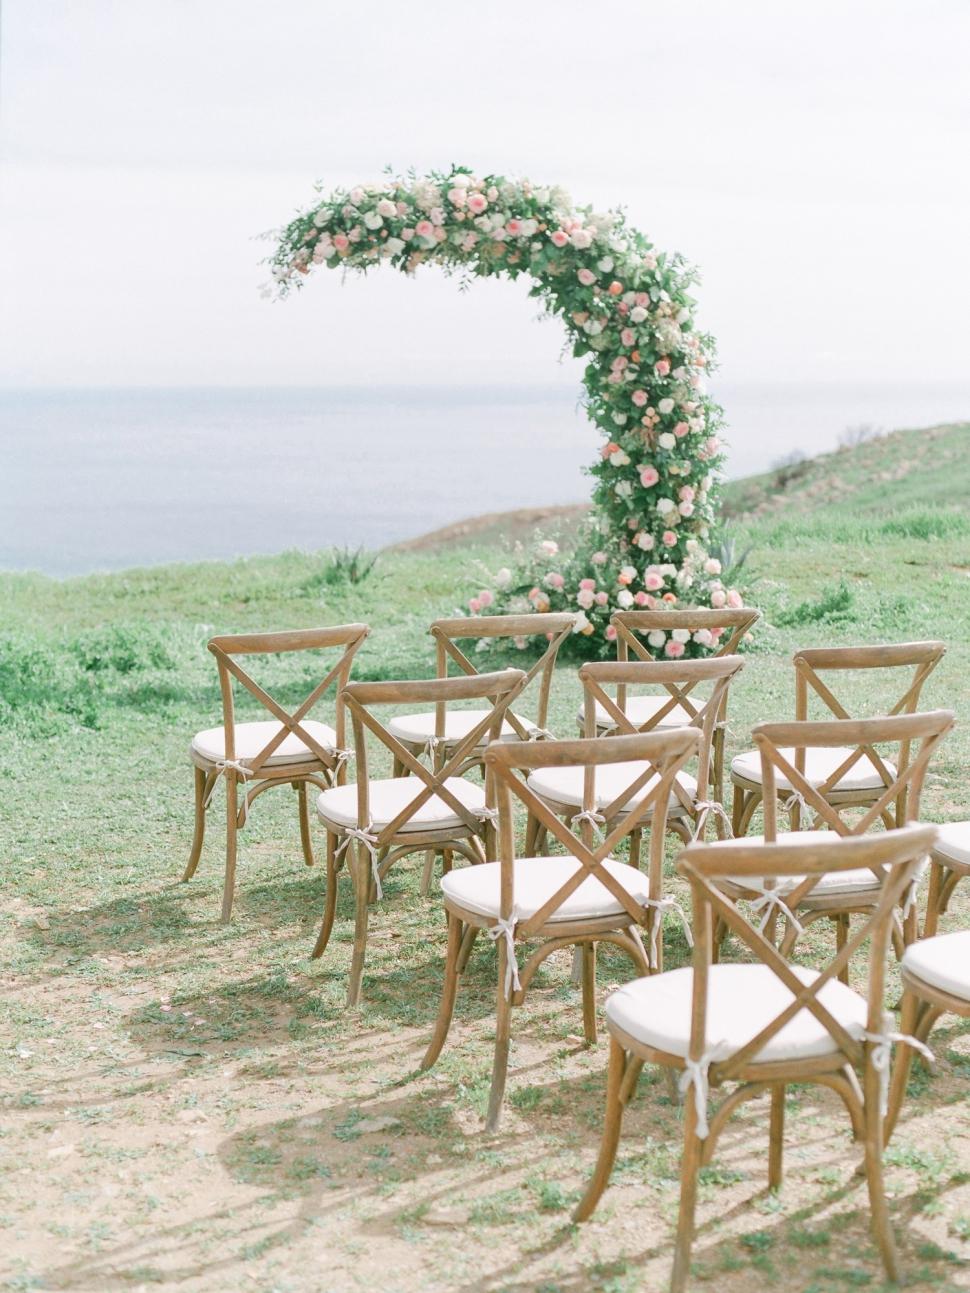 Southern-California-Malibu-Wedding-Photographer-Cassi-Claire-Deer-Creek-Ridge-Wedding_19.jpg